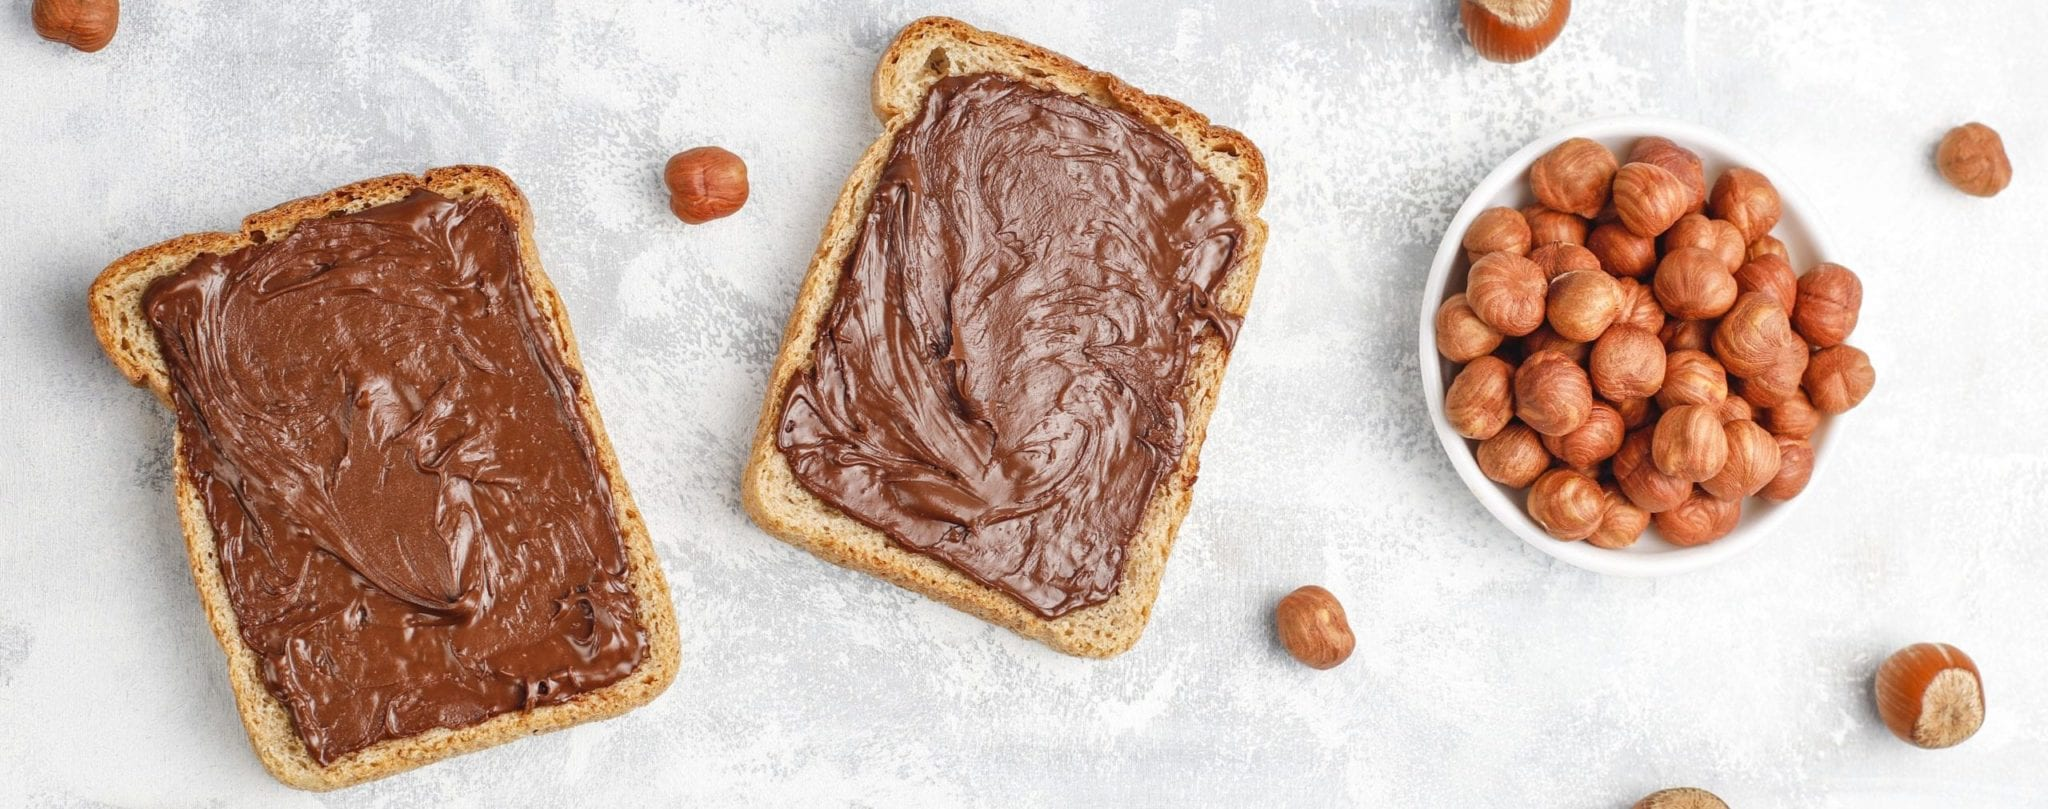 Preskočite kupovni čokoladni namaz i napravite ovu poslasticu